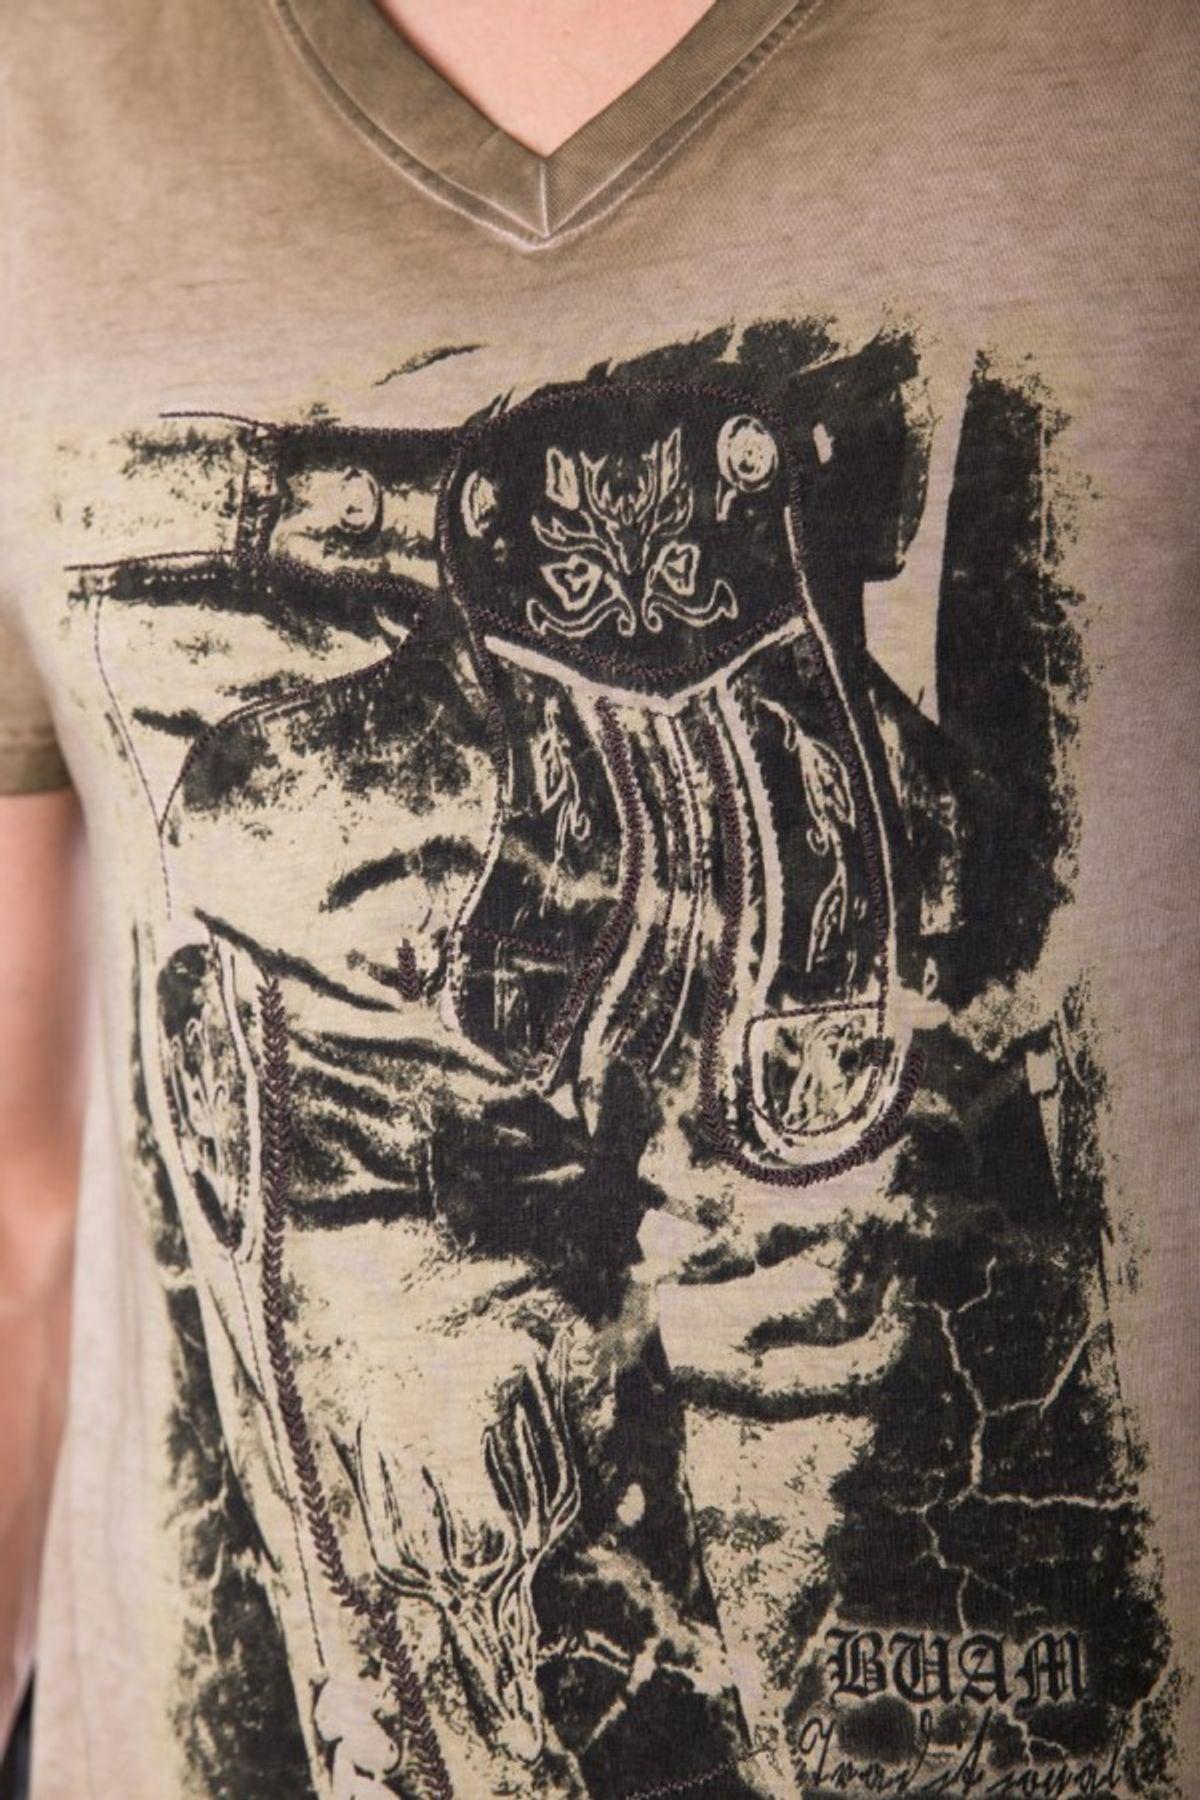 Krüger - Herren Trachten T-Shirt in braun, Seppelhose (91280-7) – Bild 5